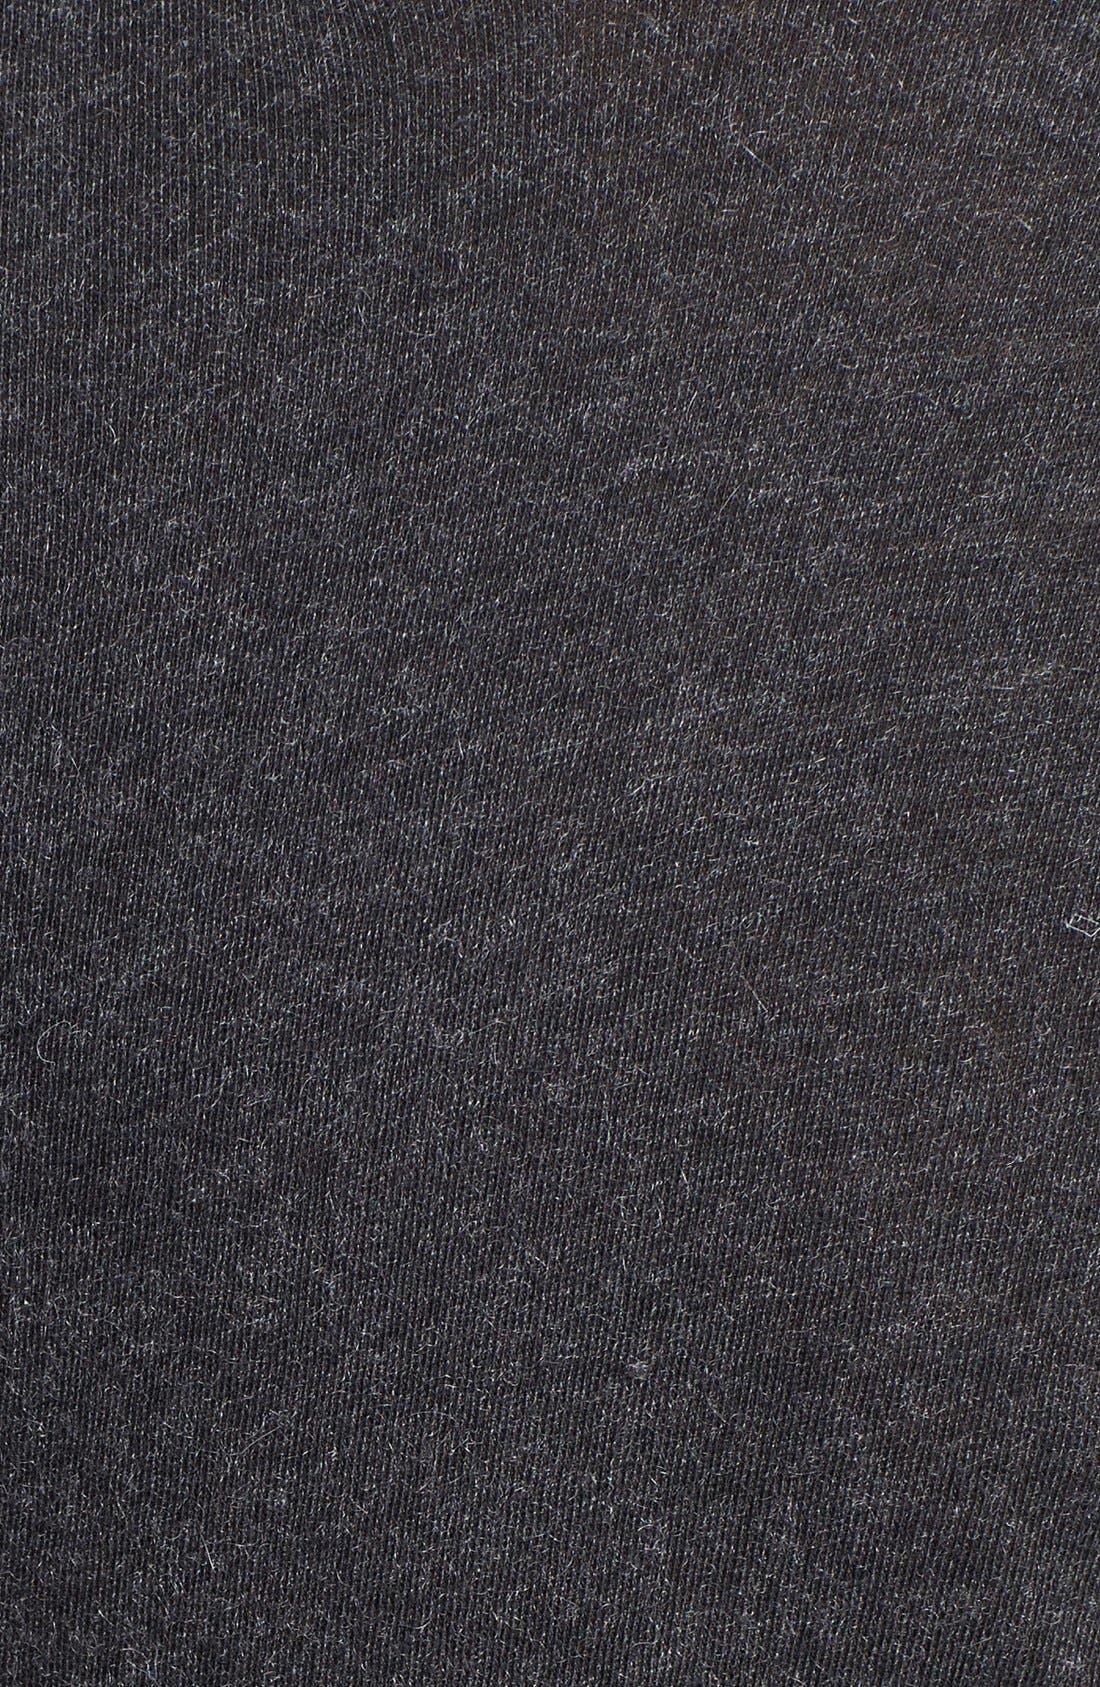 Alternate Image 4  - Enza Costa Cotton & Cashmere Jersey Sweater